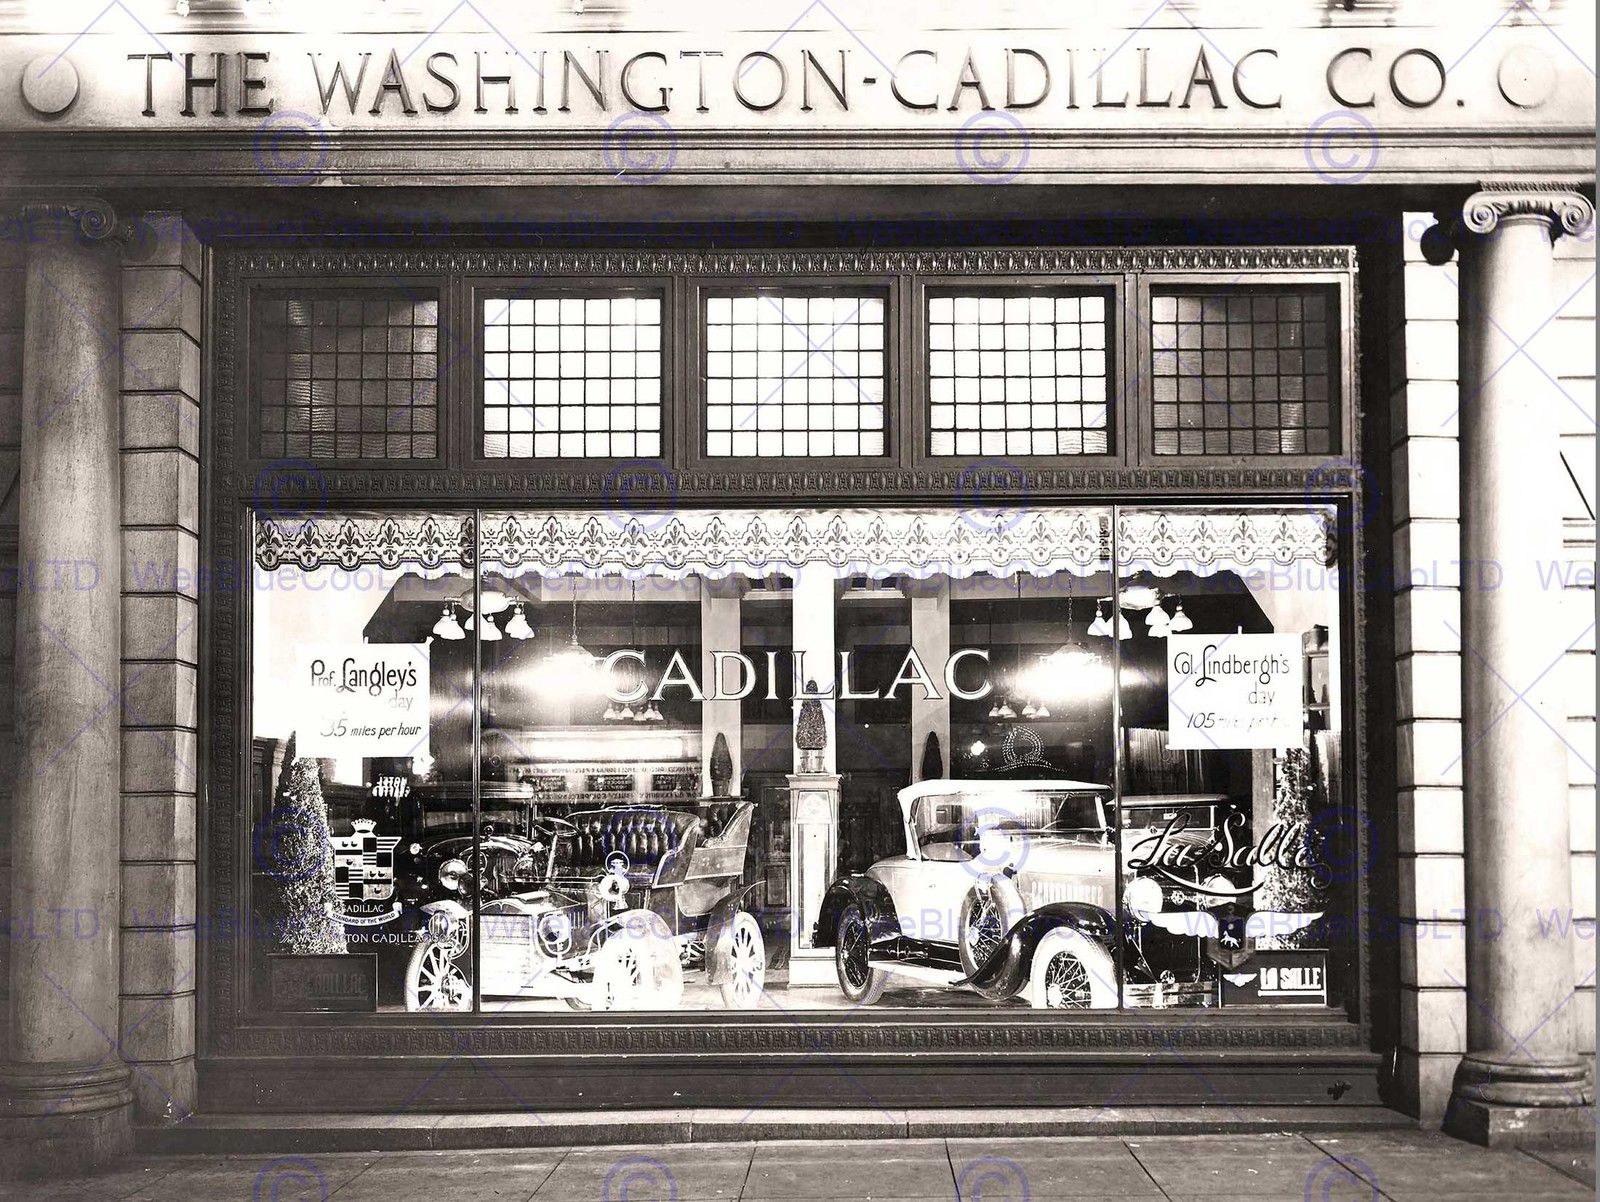 86507 TRAN MEMORABILIA CAR CADILLAC WASHINGTON Decor WALL PRINT POSTER CA